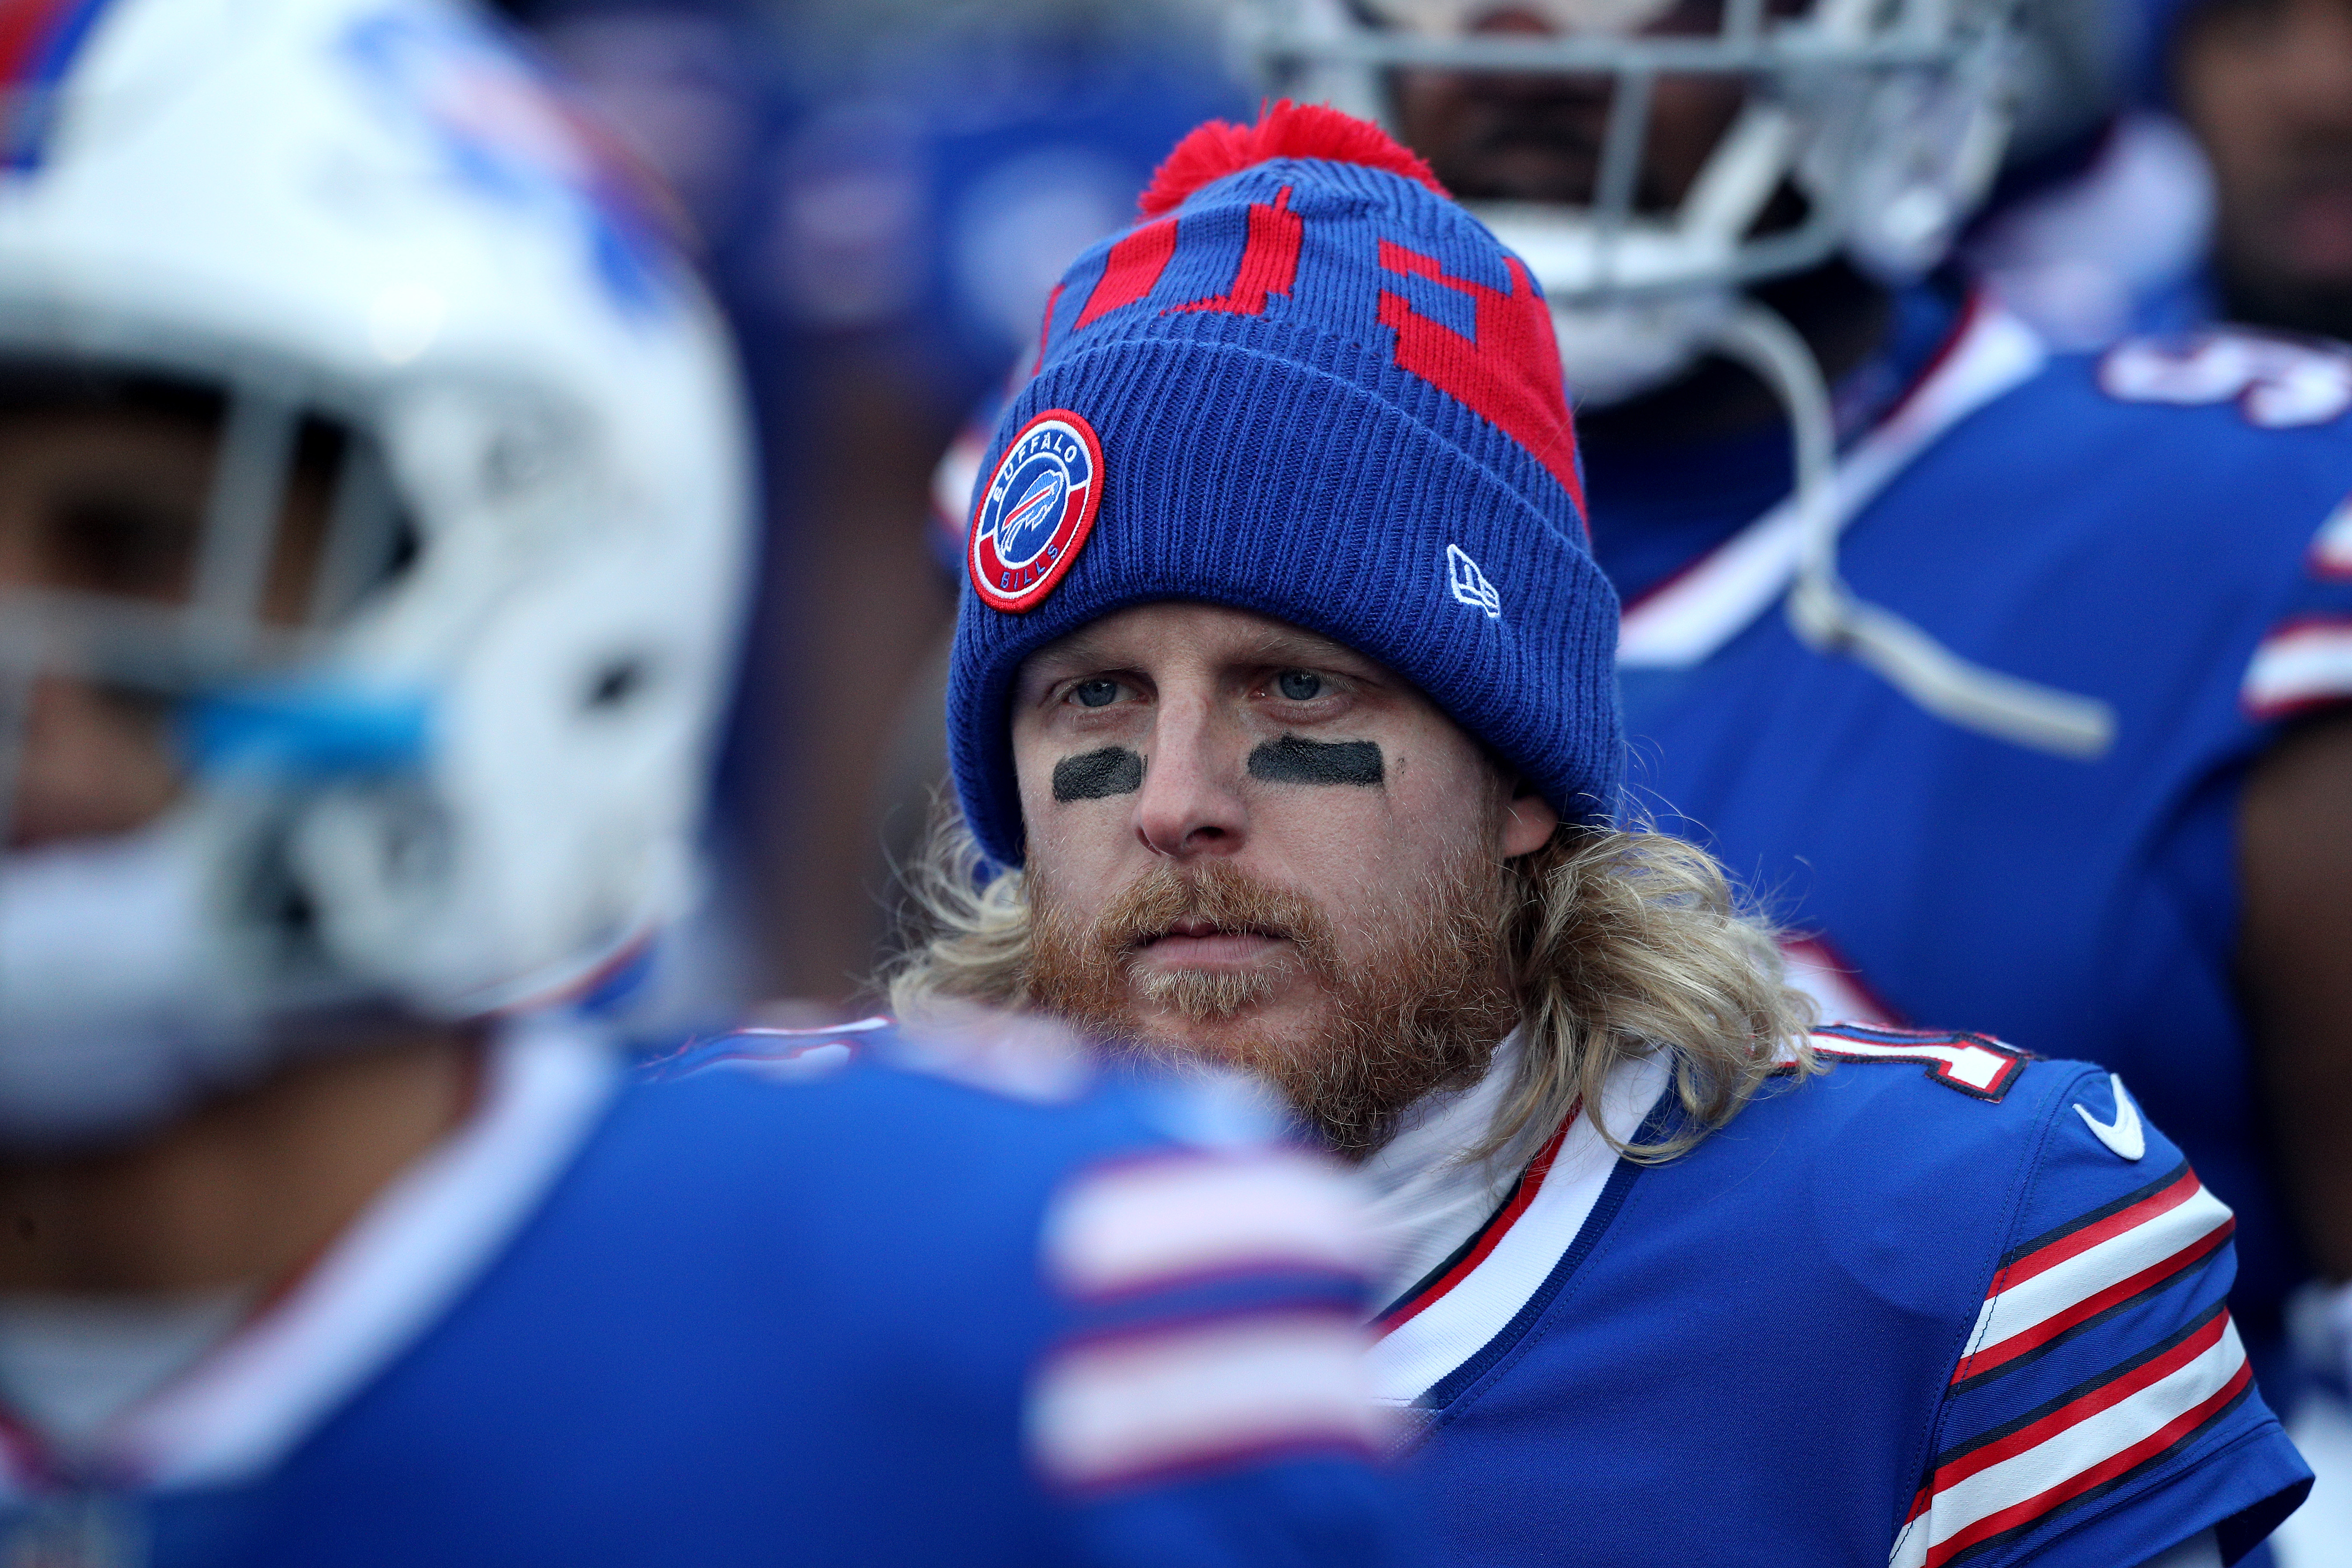 The Buffalo Bills' Cole Beasley